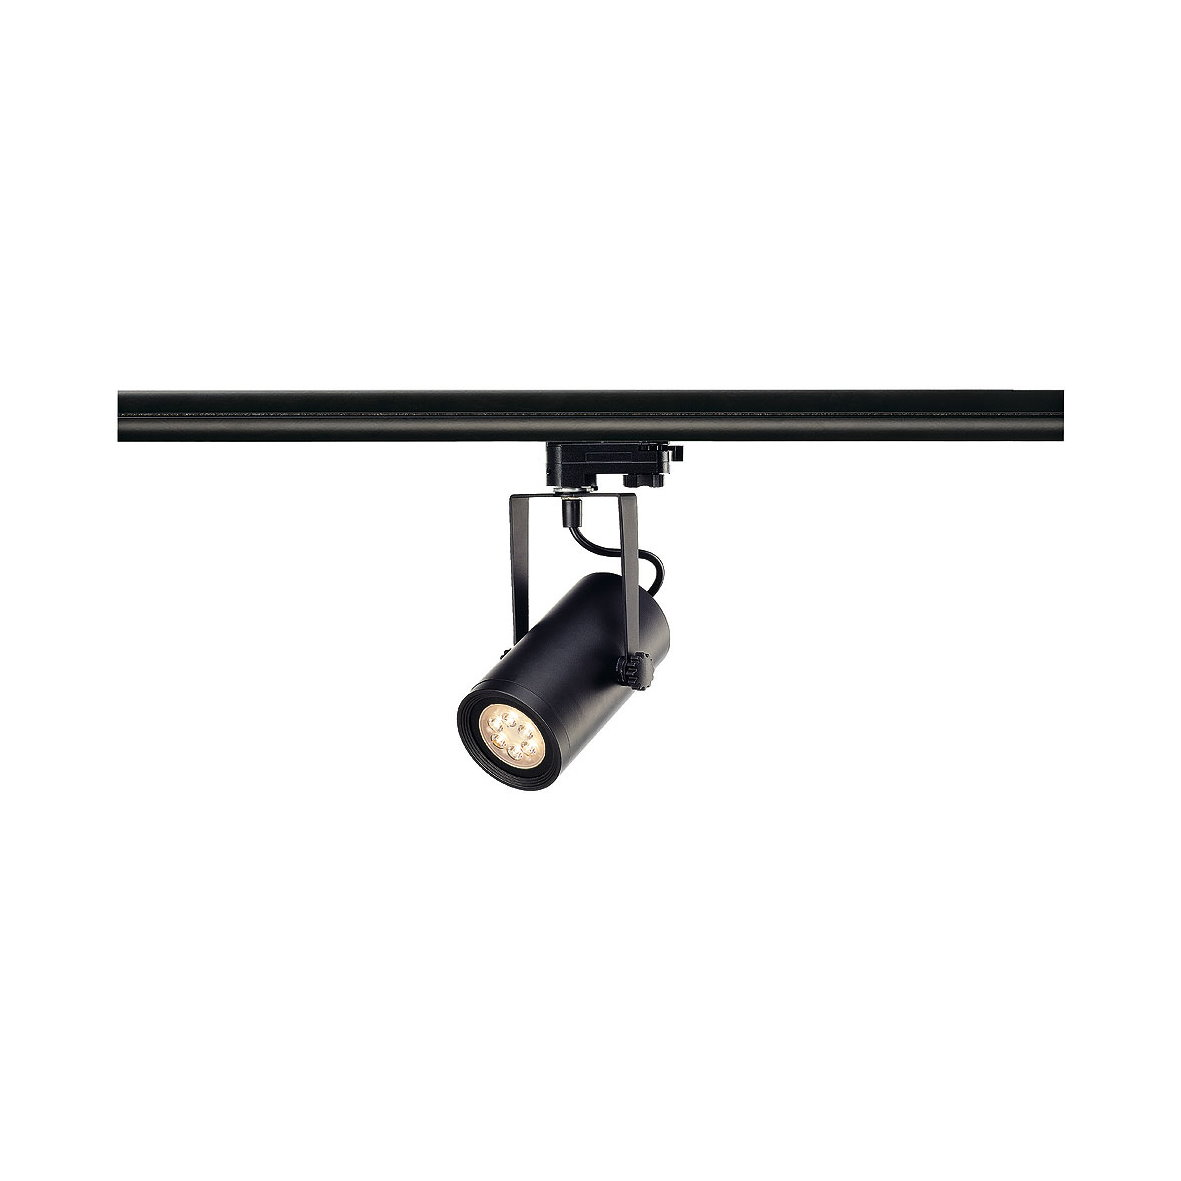 slv philips led 3 phasen spot strahler leuchte. Black Bedroom Furniture Sets. Home Design Ideas